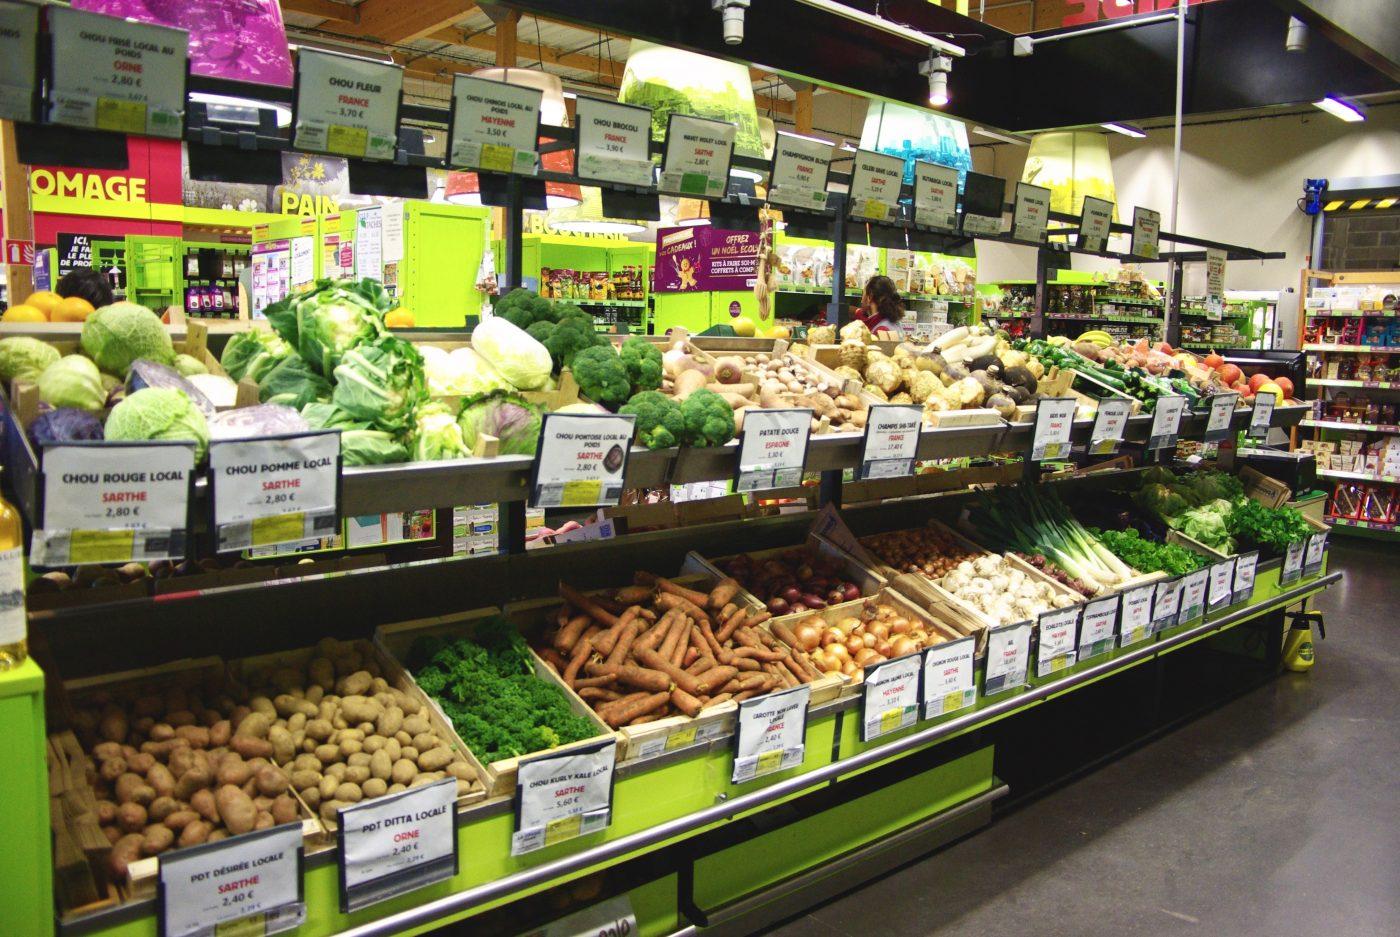 Le fenouil biocoop ruaudin magasin bio pr s du circuit for Decathlon le mans sud ruaudin ruaudin